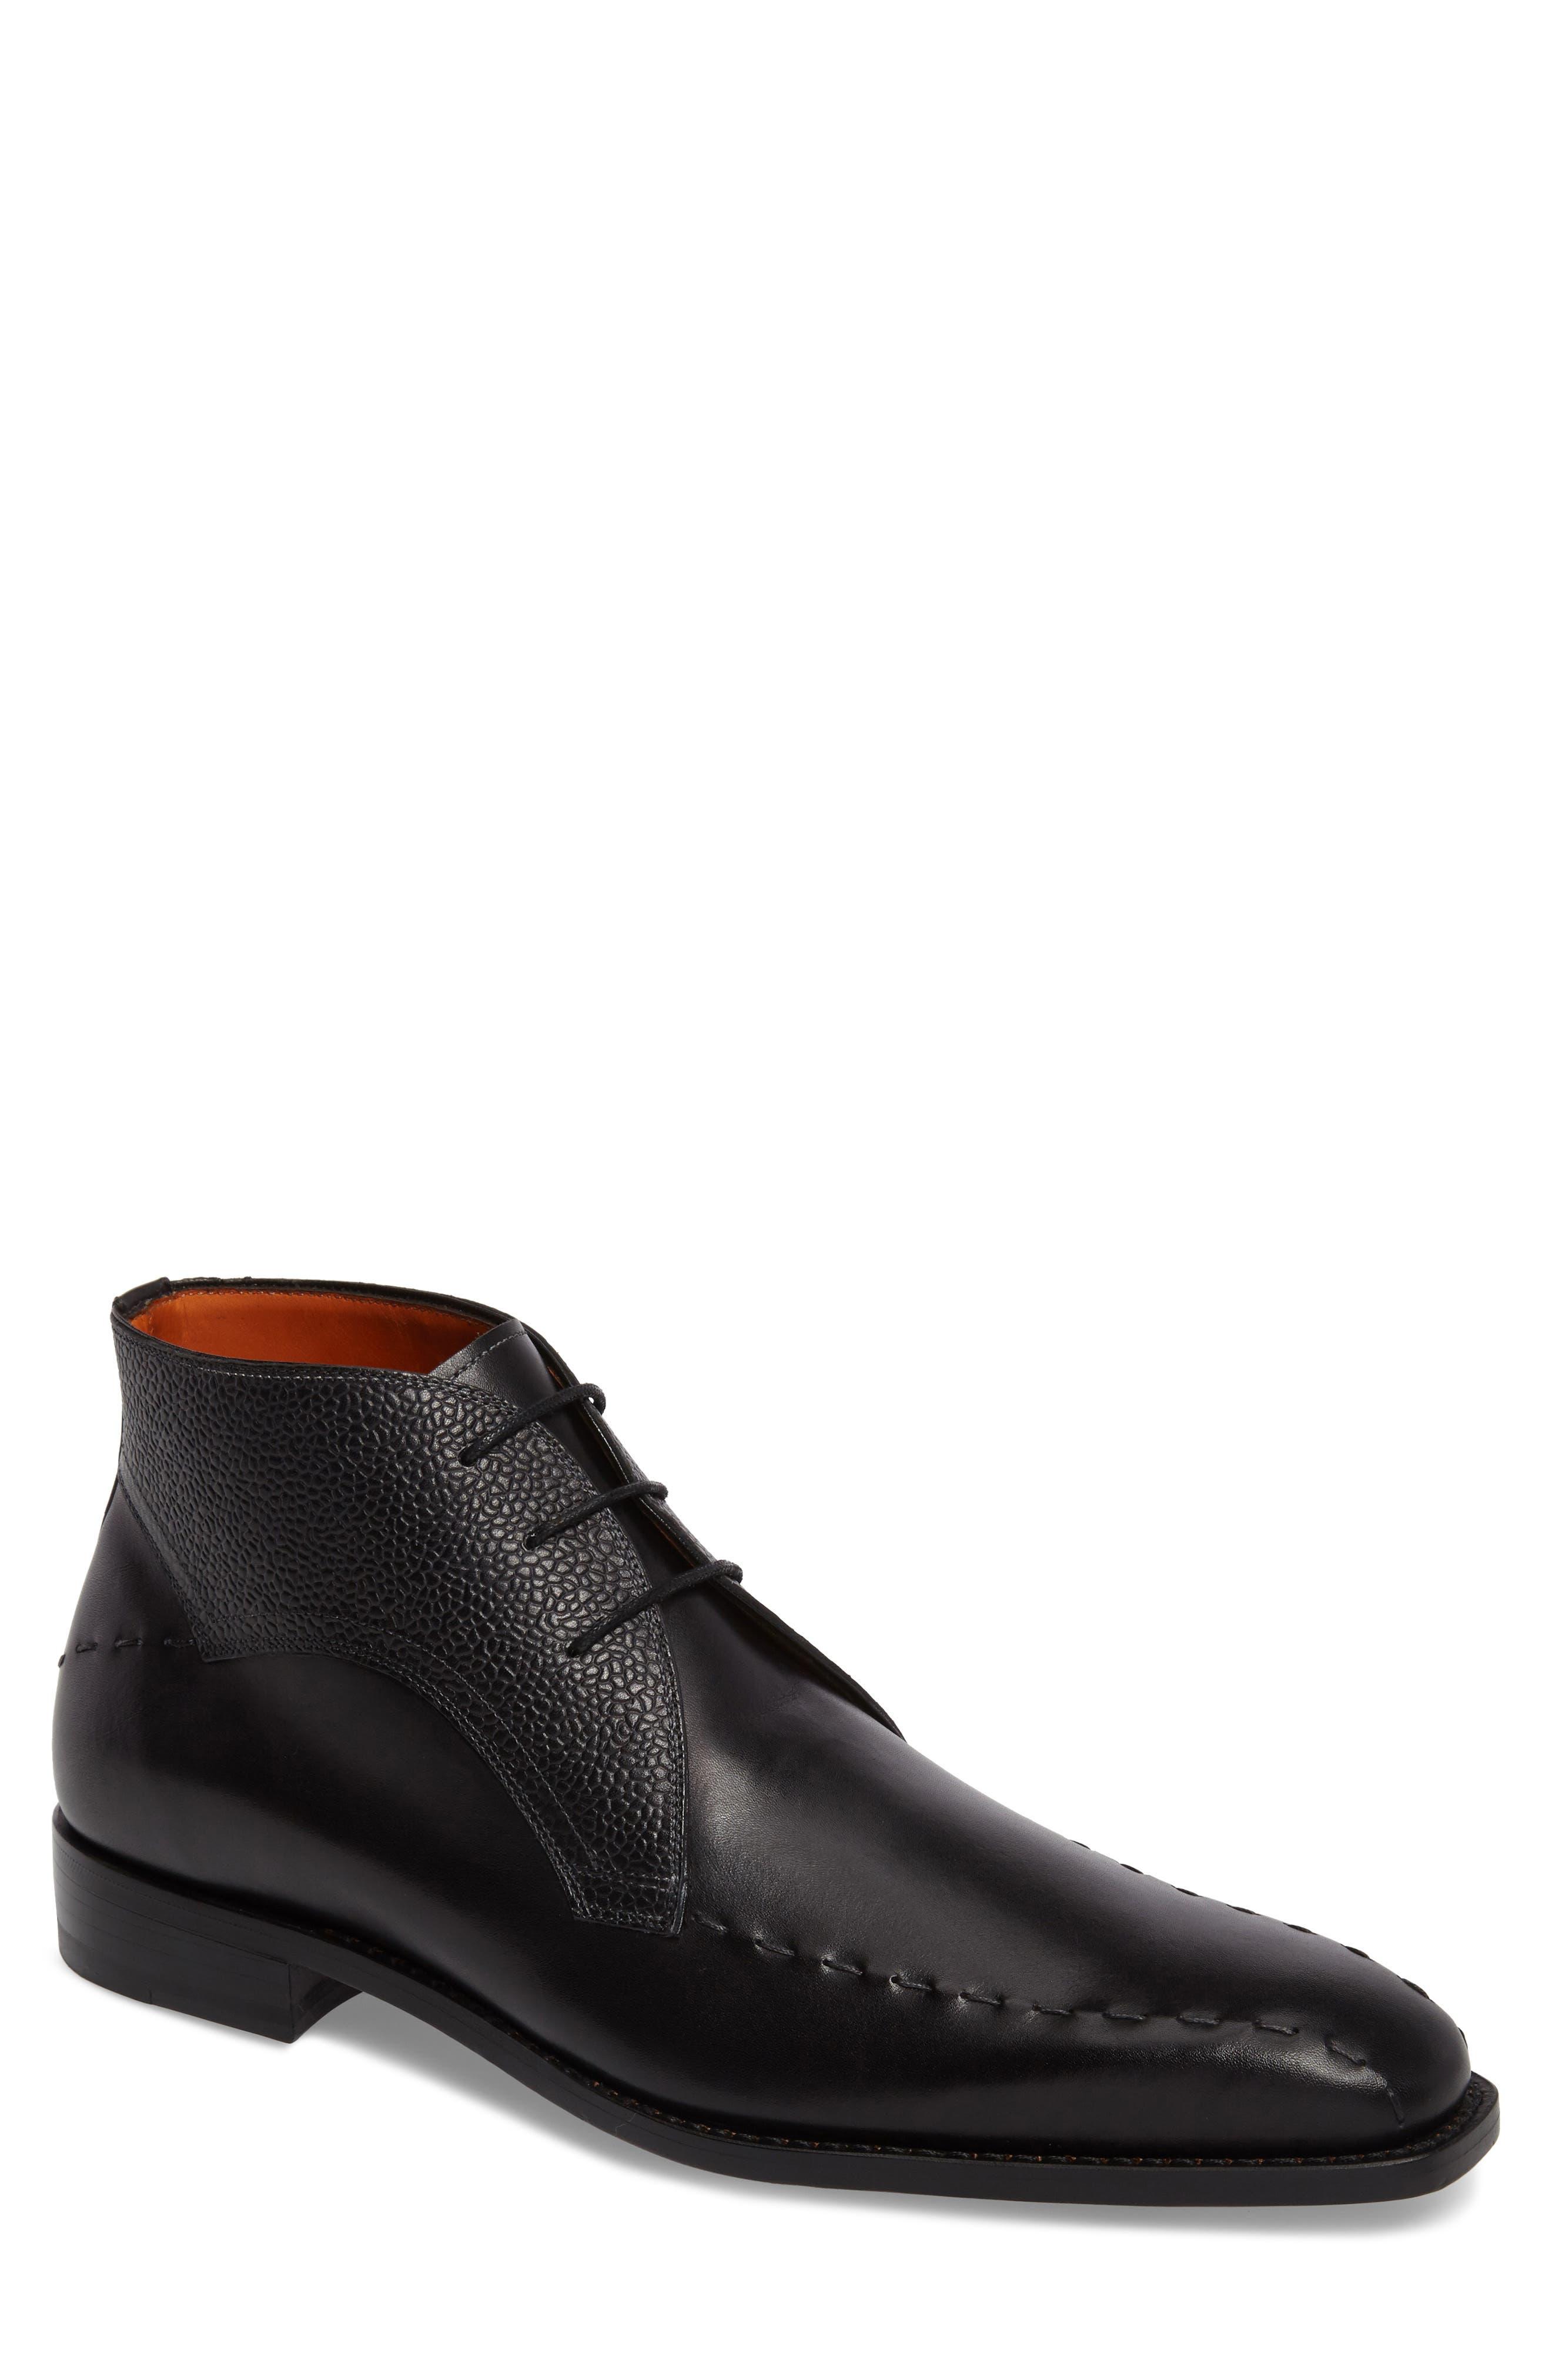 Moriles Chukka Boot,                             Main thumbnail 1, color,                             Black Leather